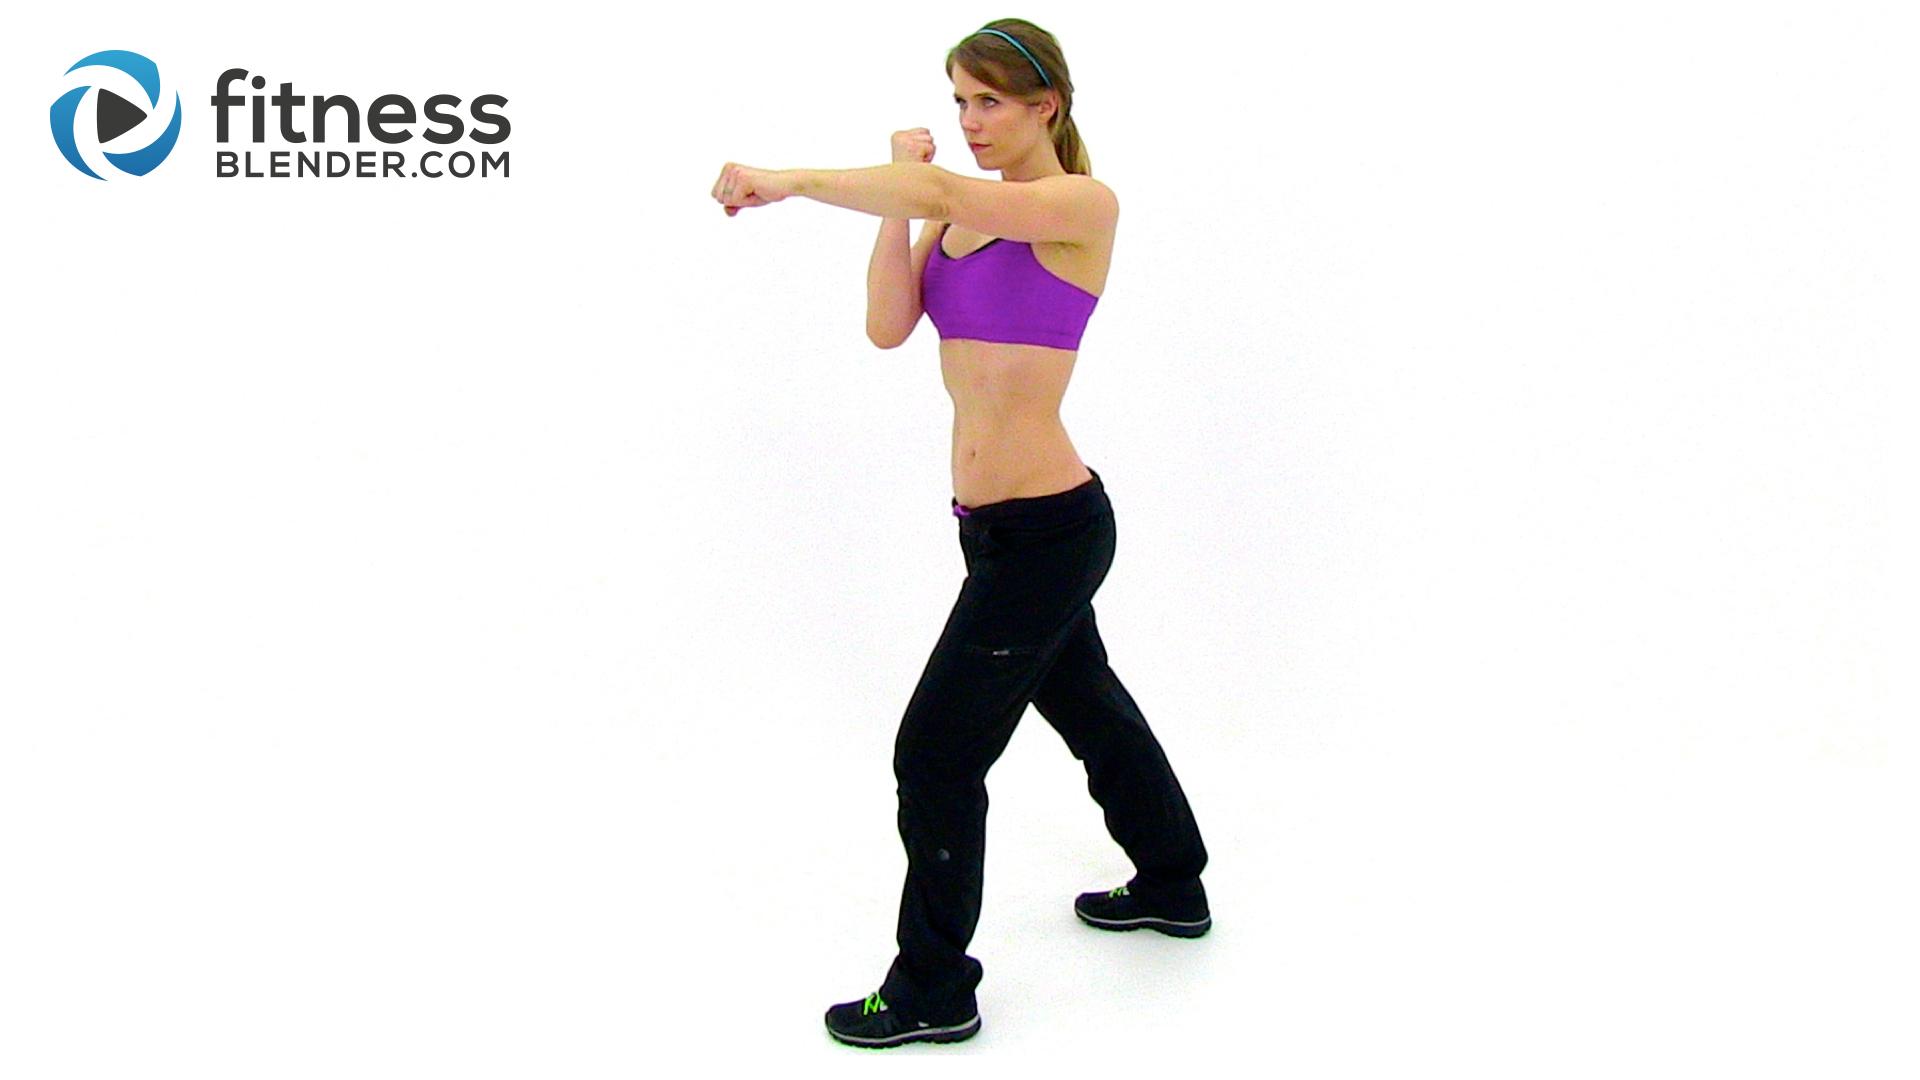 Shortcuts: Kickboxing Uppercut Workout Video forecasting